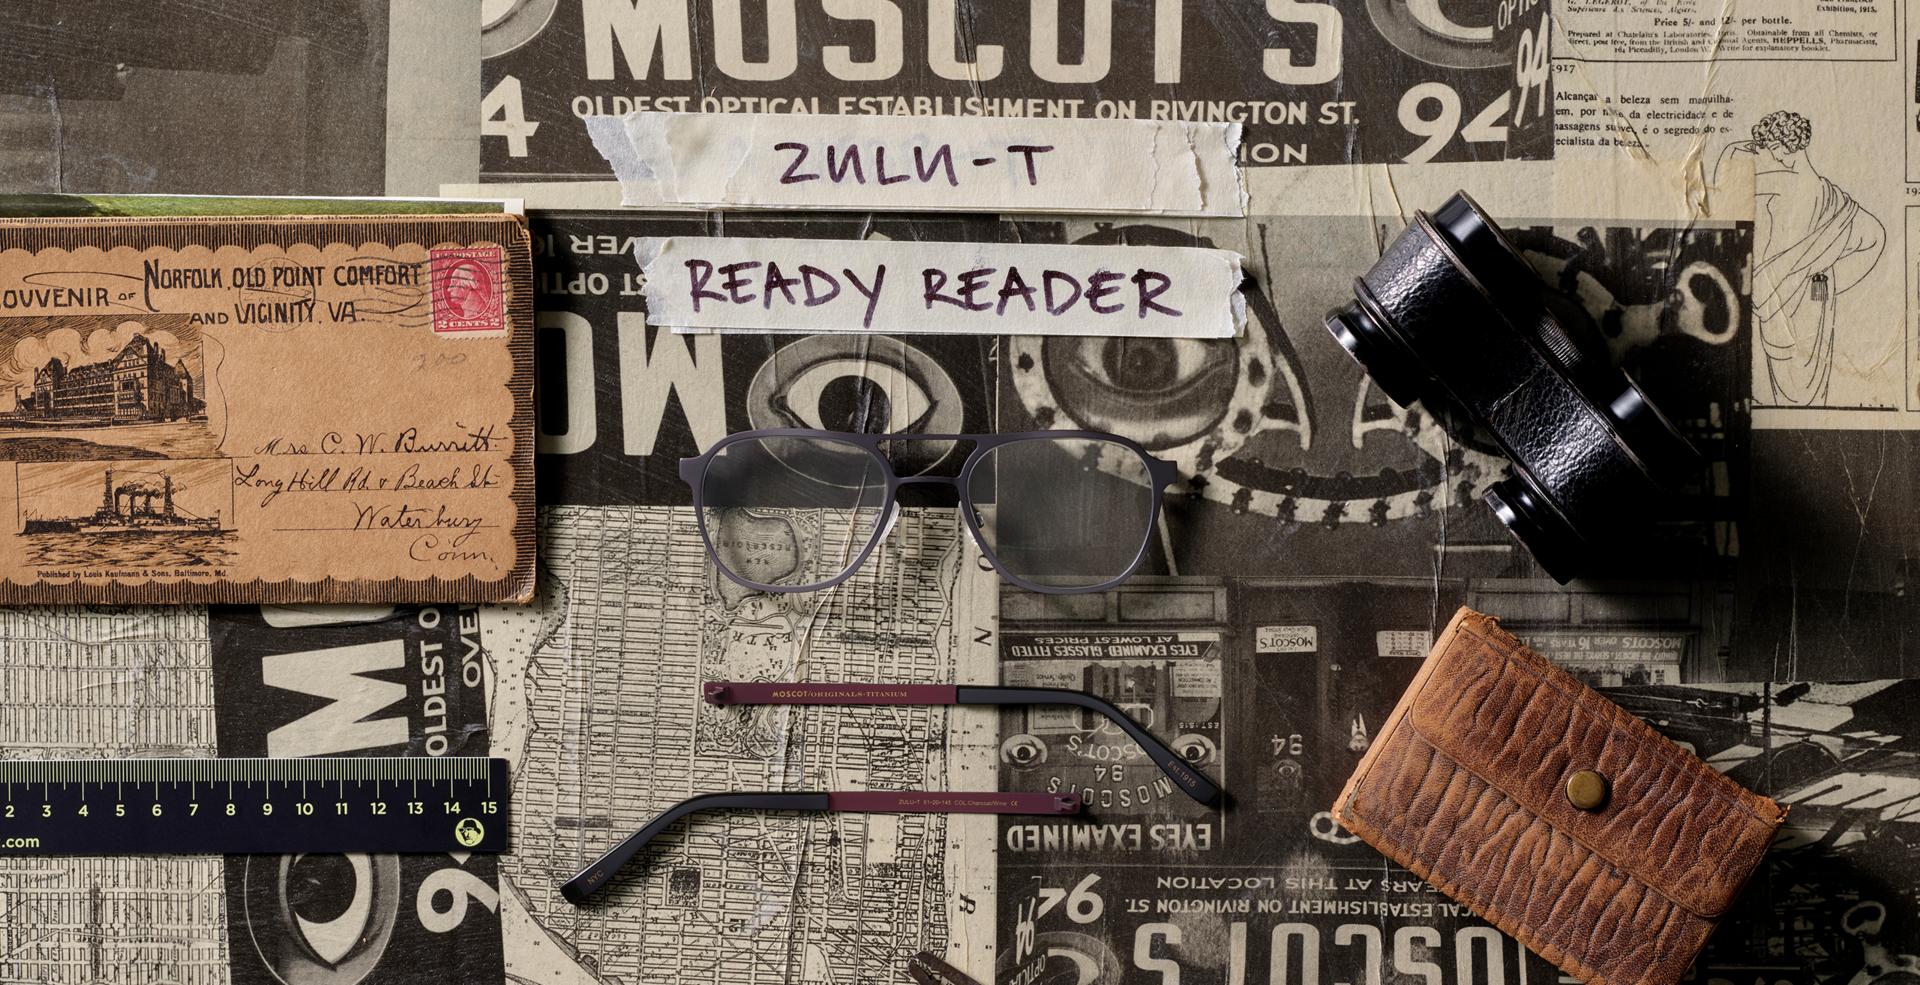 ZULU-T READY READER